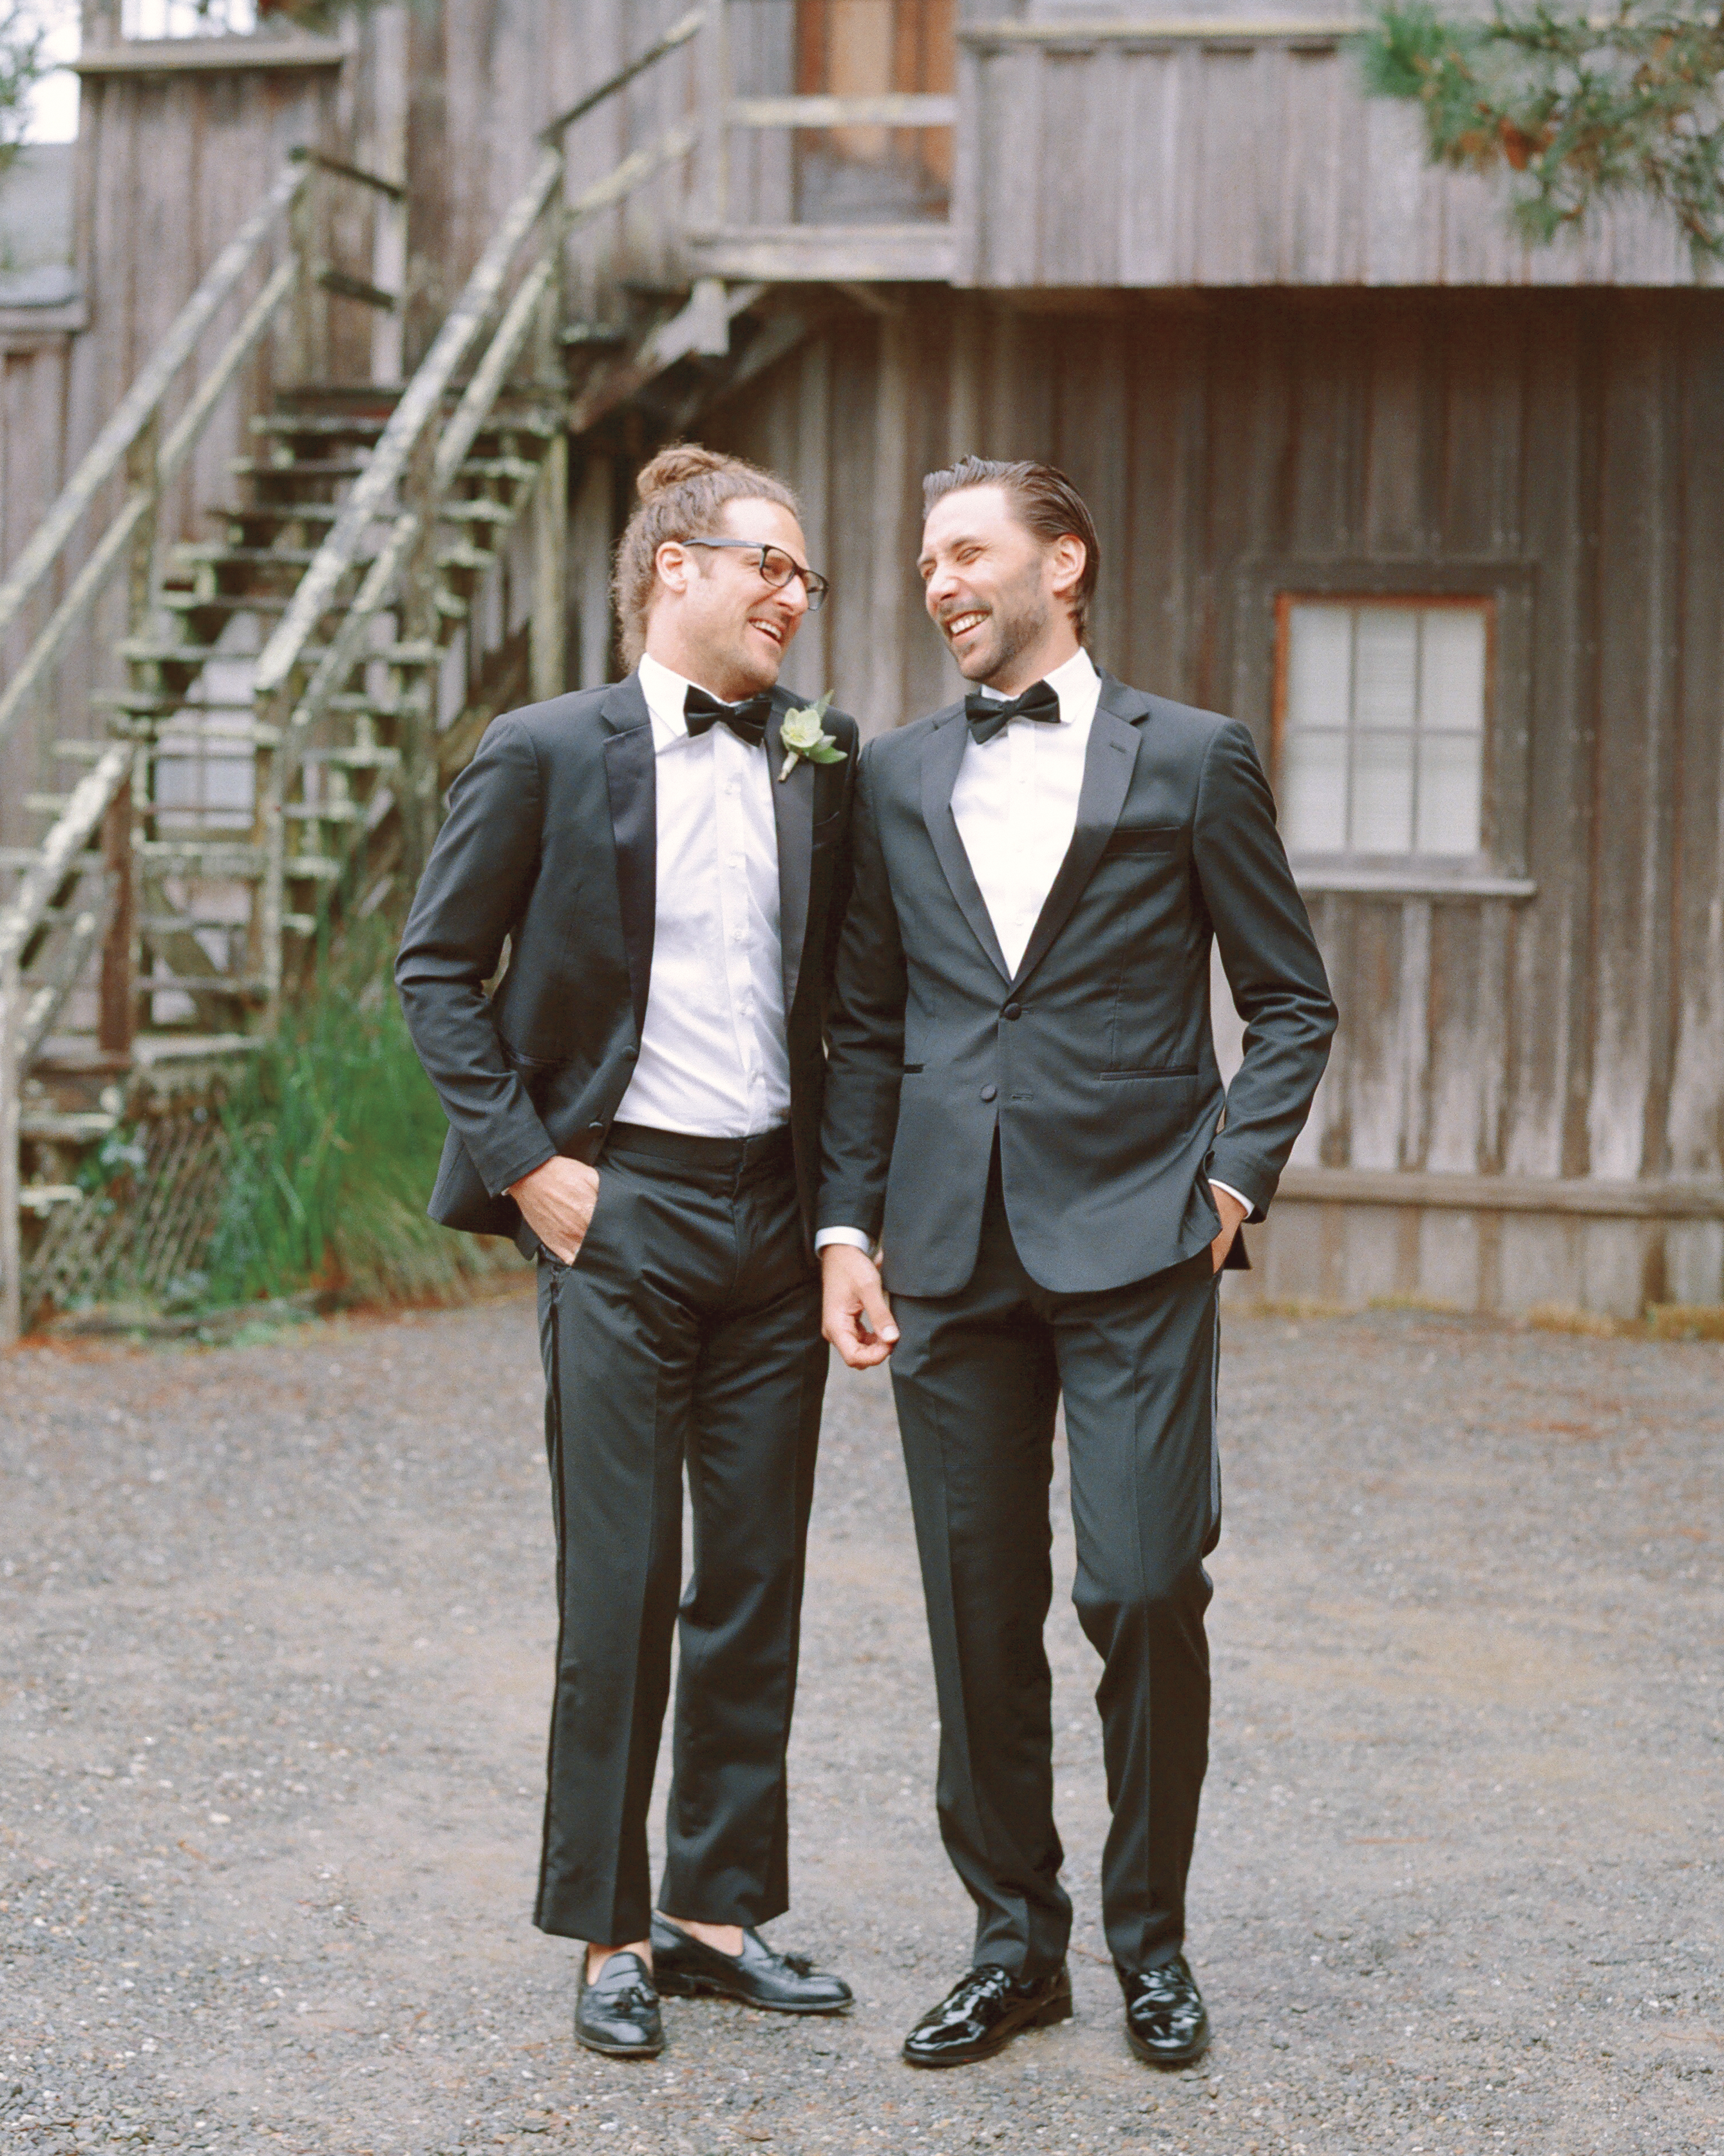 alison-markus-real-wedding-elizabeth-messina-076-ds111251.jpg